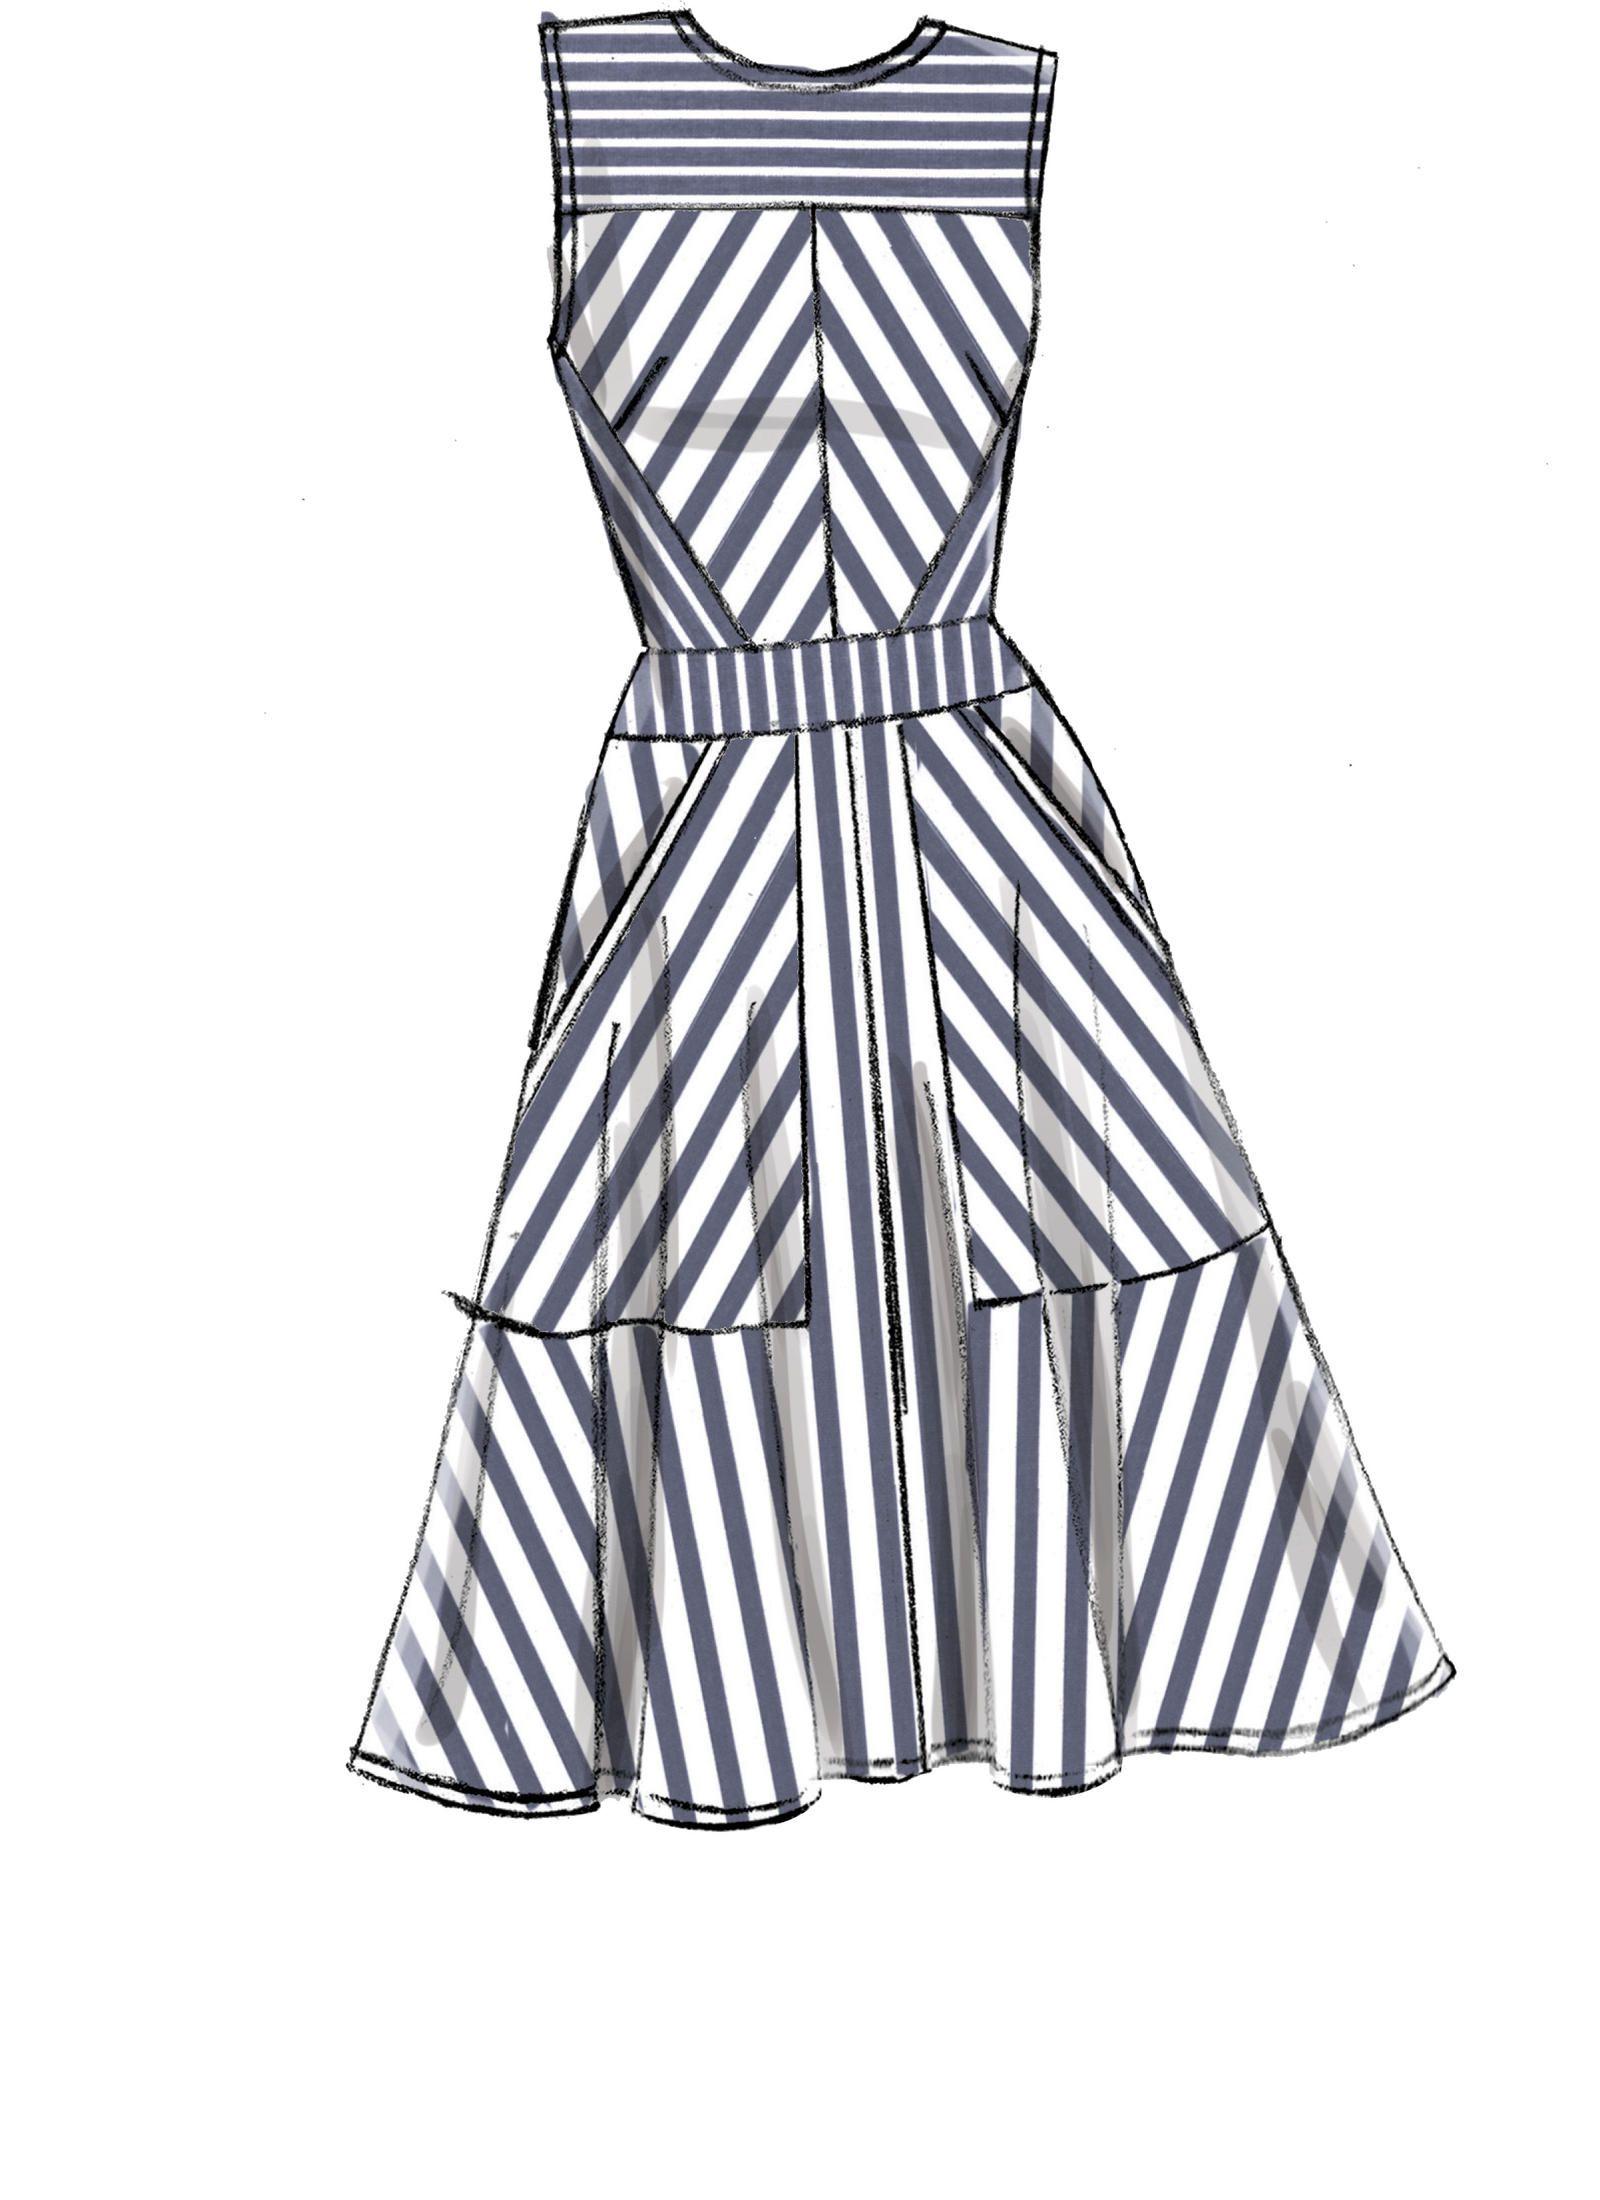 V9357 Sewing Dresses Fashion Fashion Sewing Pattern